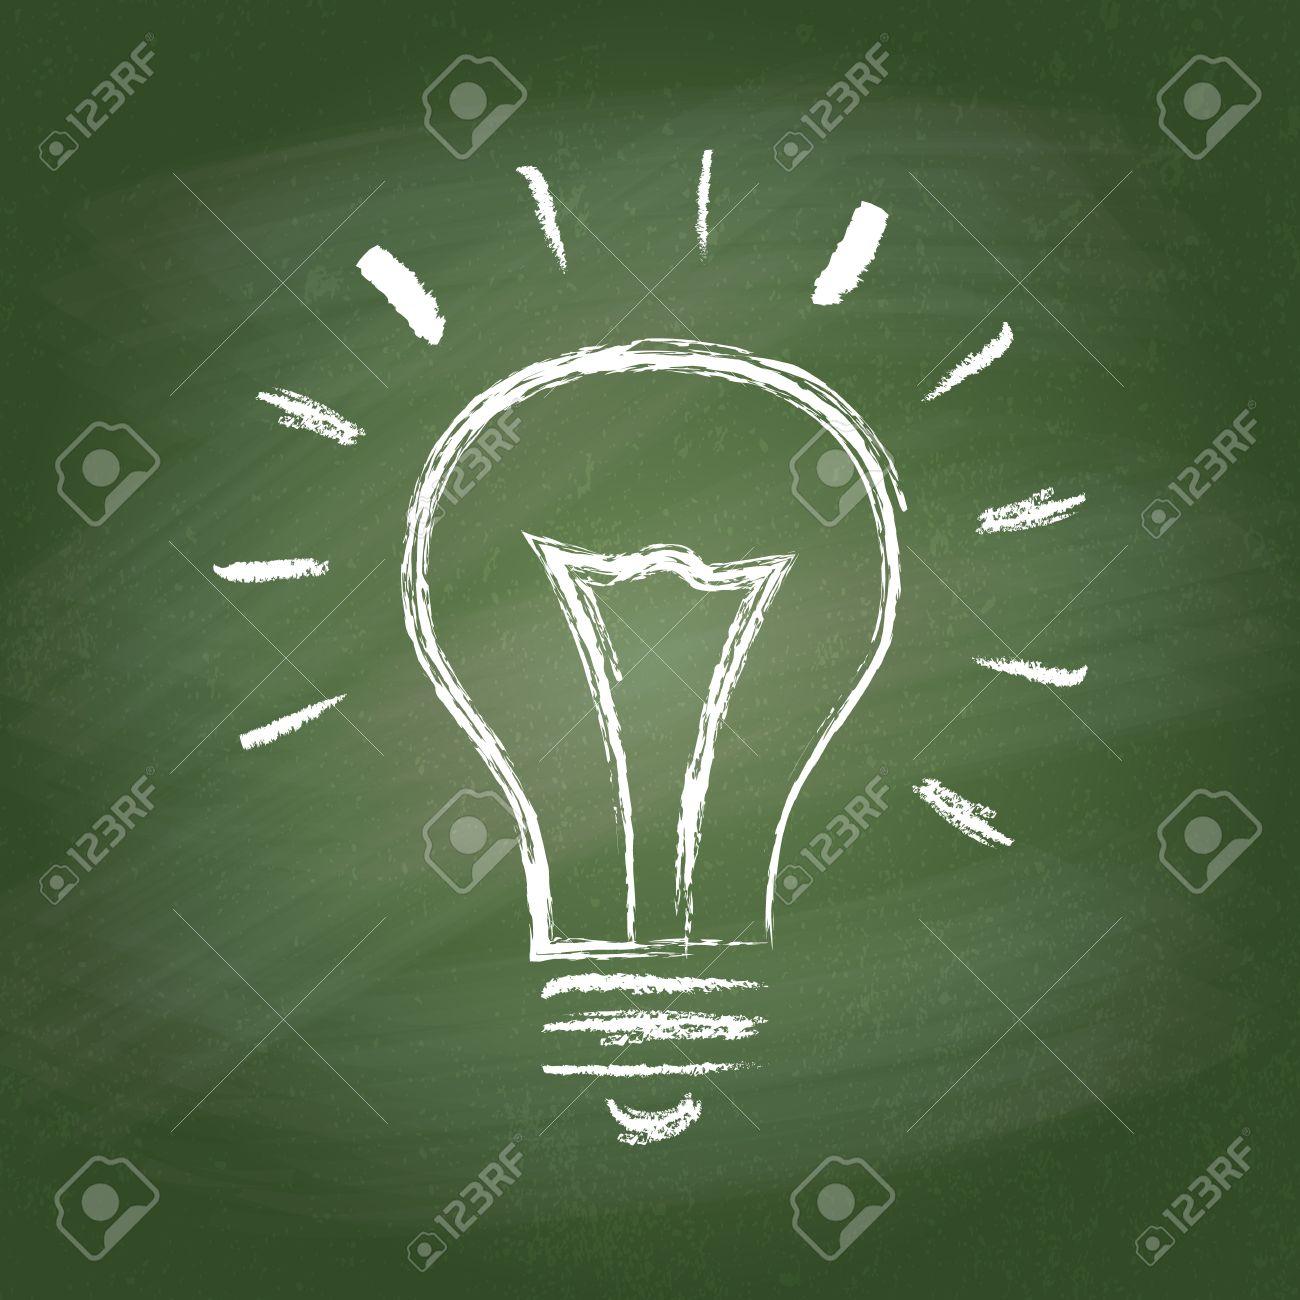 Light bulb vector idea icon on chalk board. Chalk hand-drawn graphic style. Realistic vector EPS10 illustration. - 38816218